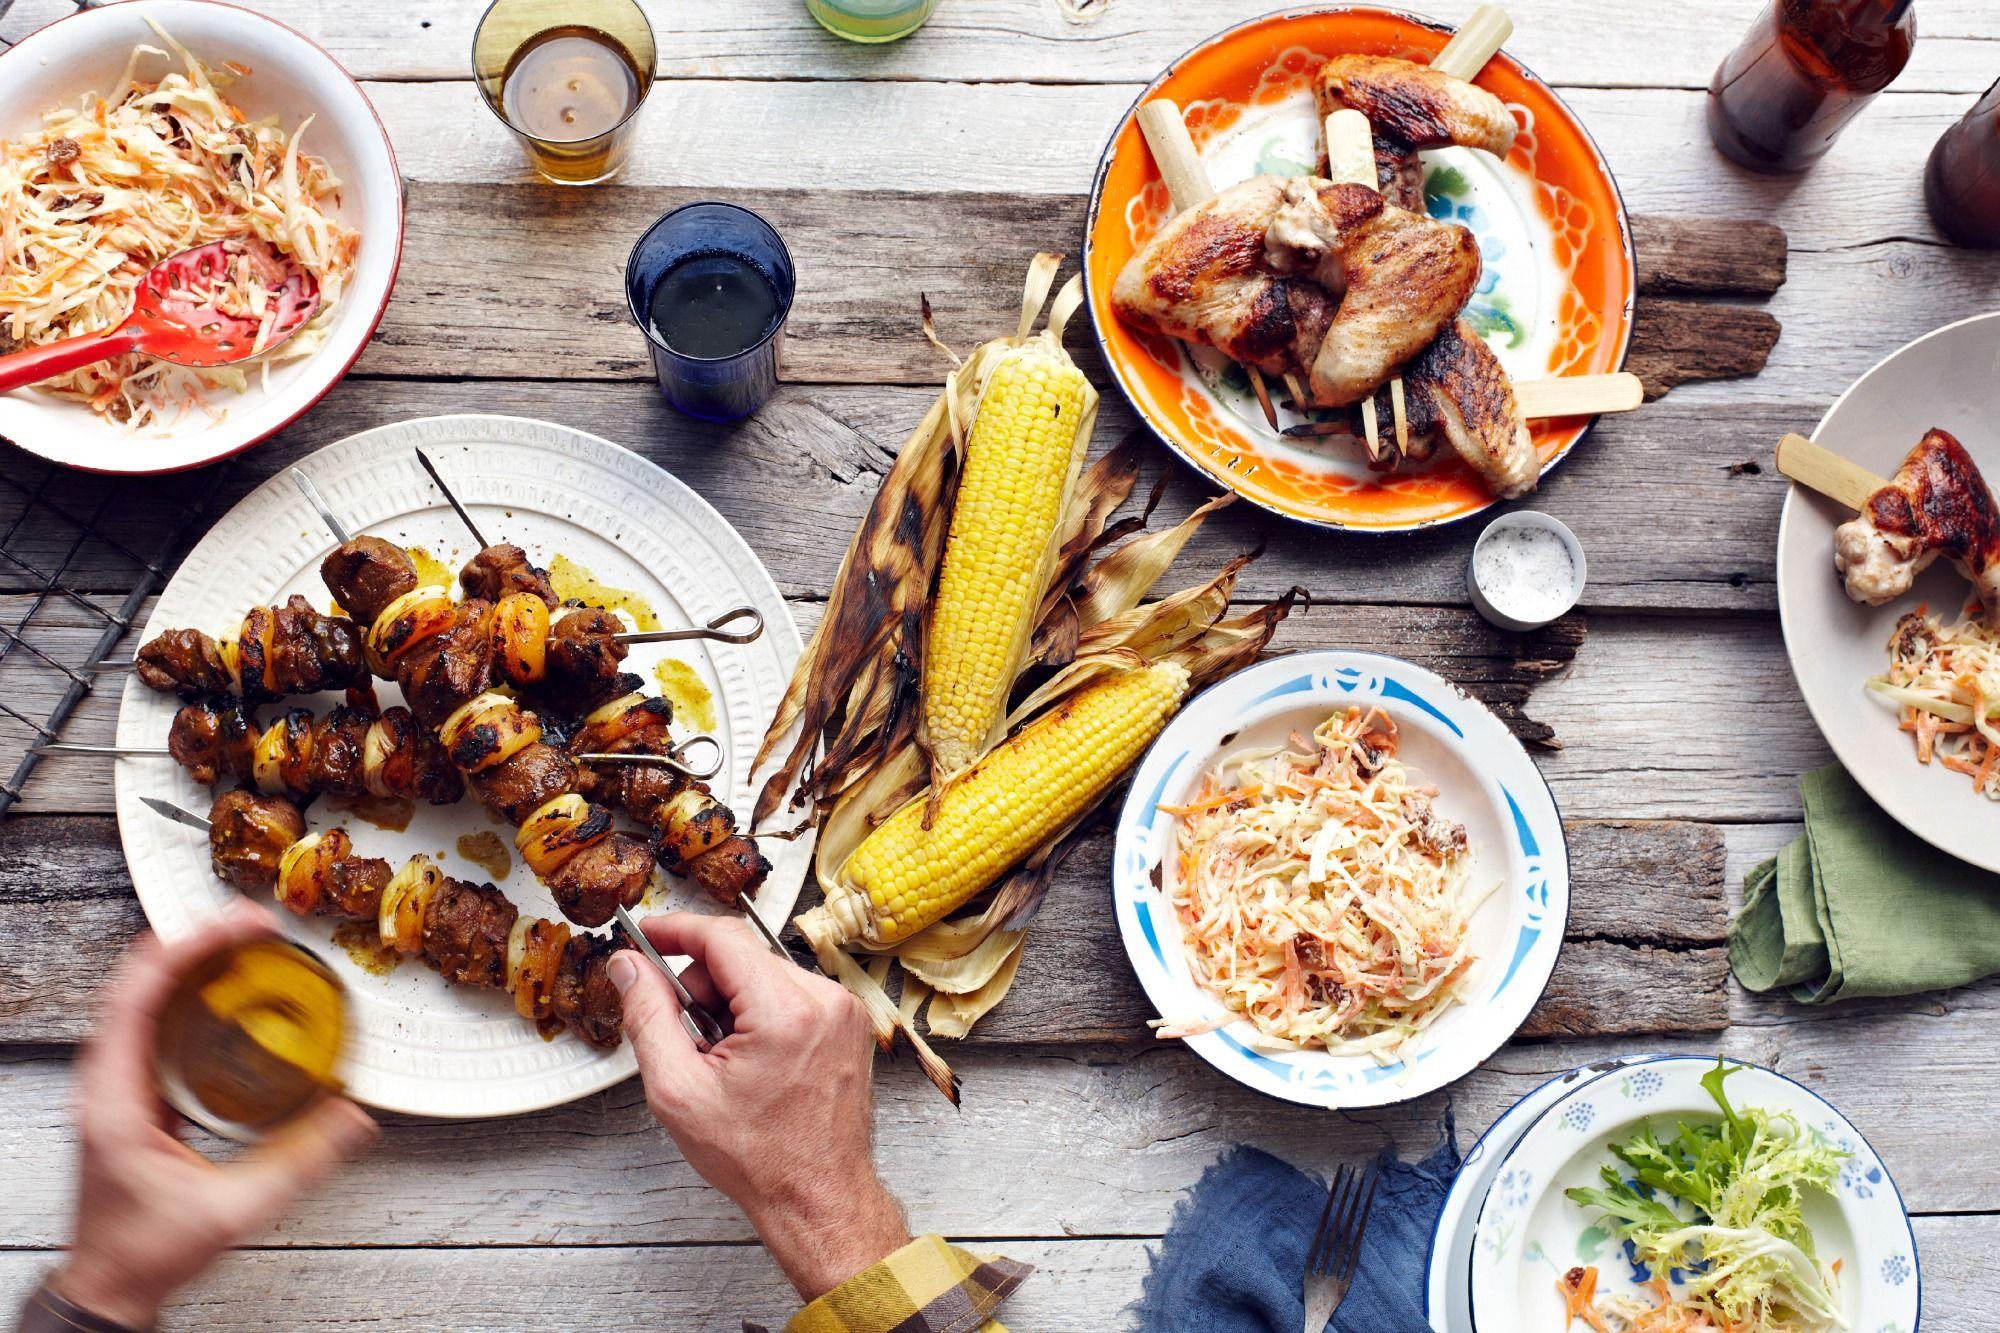 Seafood Dinner Party Menu Ideas Part - 41: Summer Cookout Menu Ideas - Grilling Recipes For Summer Holiday Menus U2014Delish.com